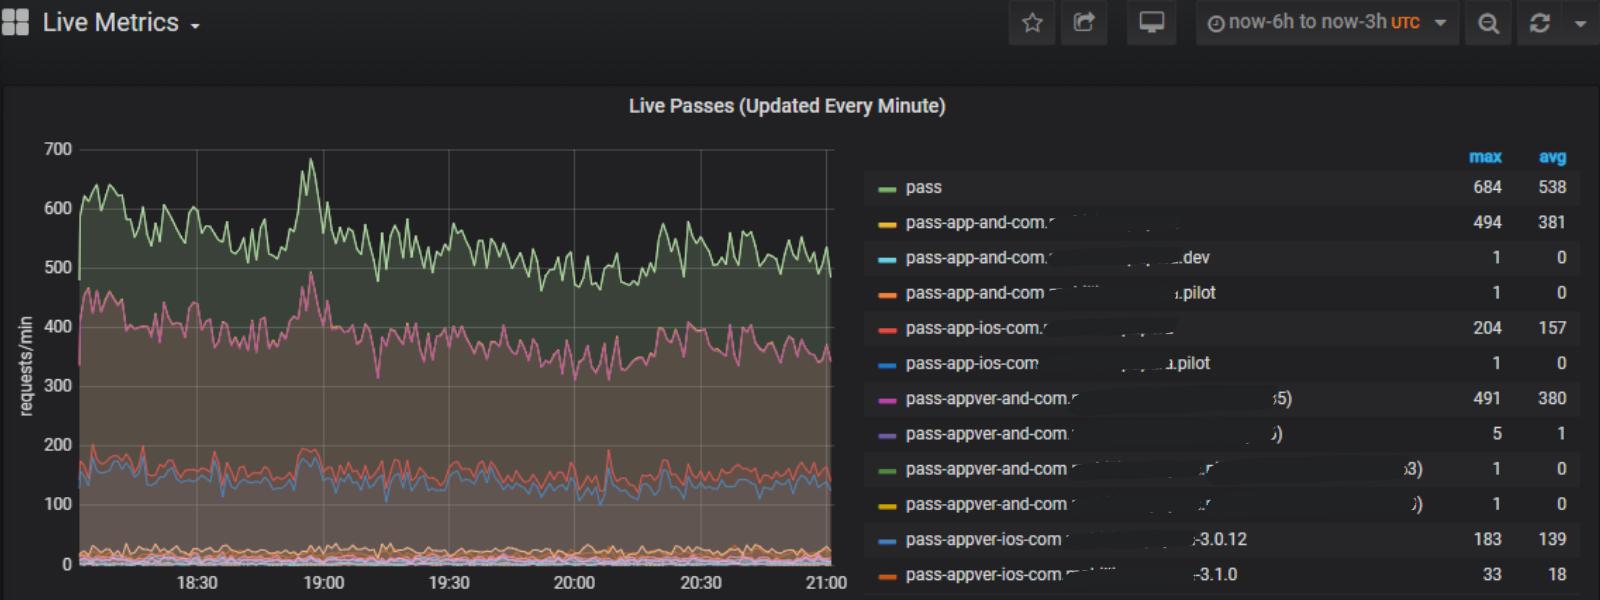 Screenshot of Approov customer metrics graph showing live passes